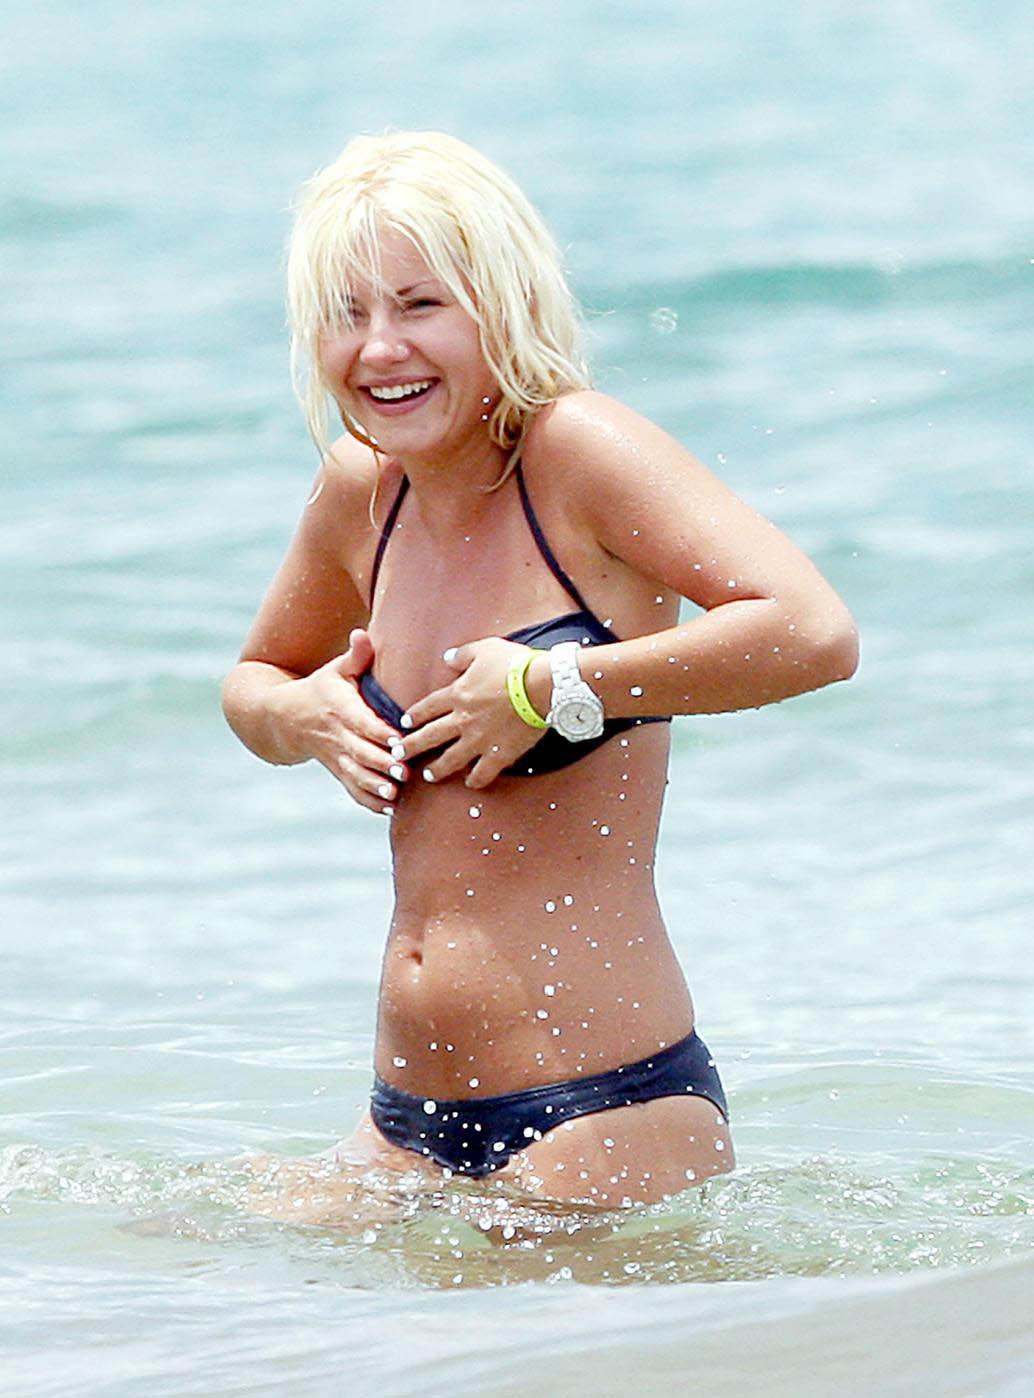 elisha cuthbert in bikini. FOR MORE BIKINI PICS CLICK HERE